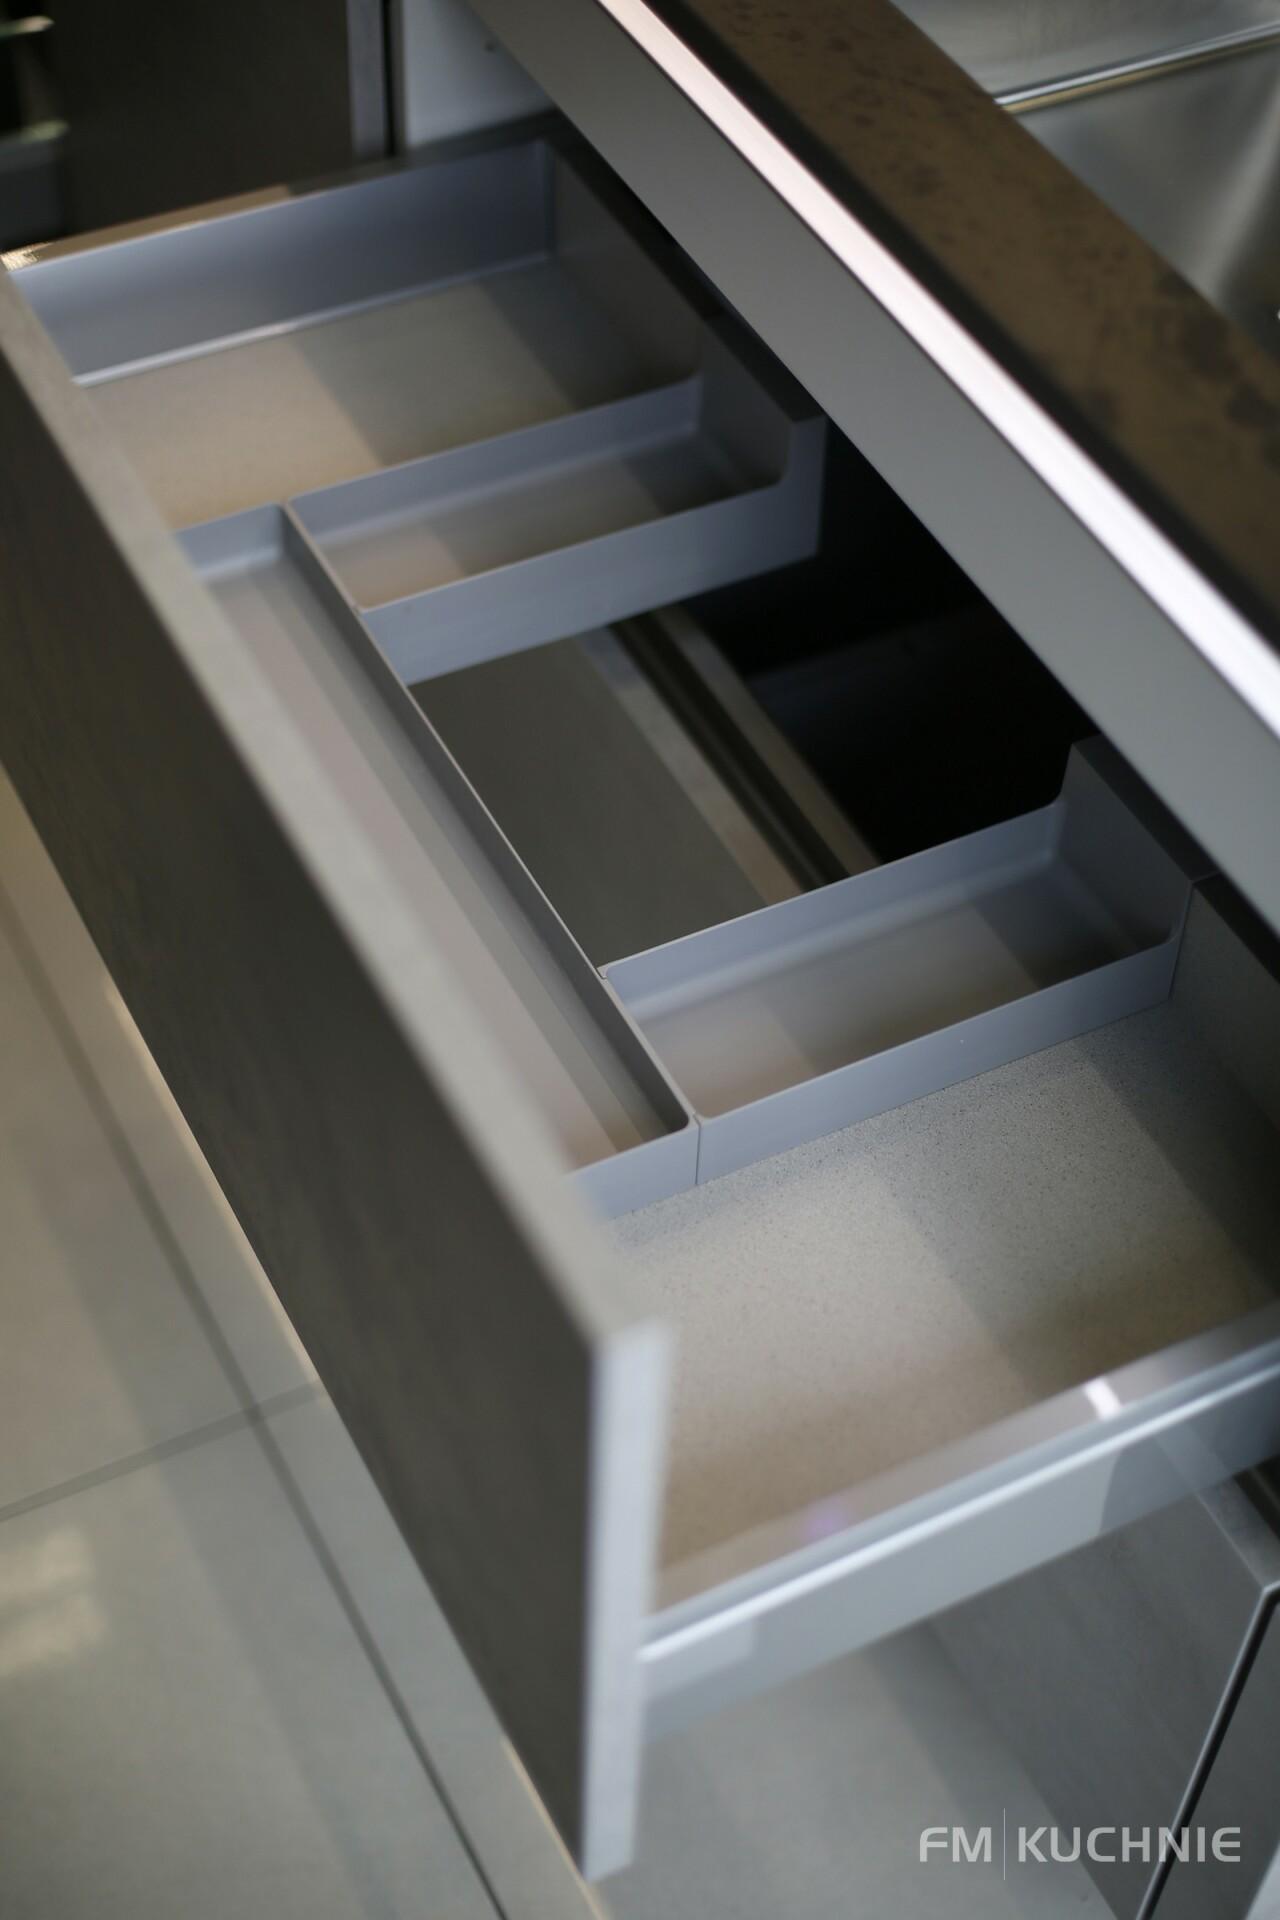 Kuchnia na wymiar Nobilia Riva 892 szary beton - Riva 839 szary terra beton - Meble kuchenne Kraków -11- FM KUCHNIE Kraków